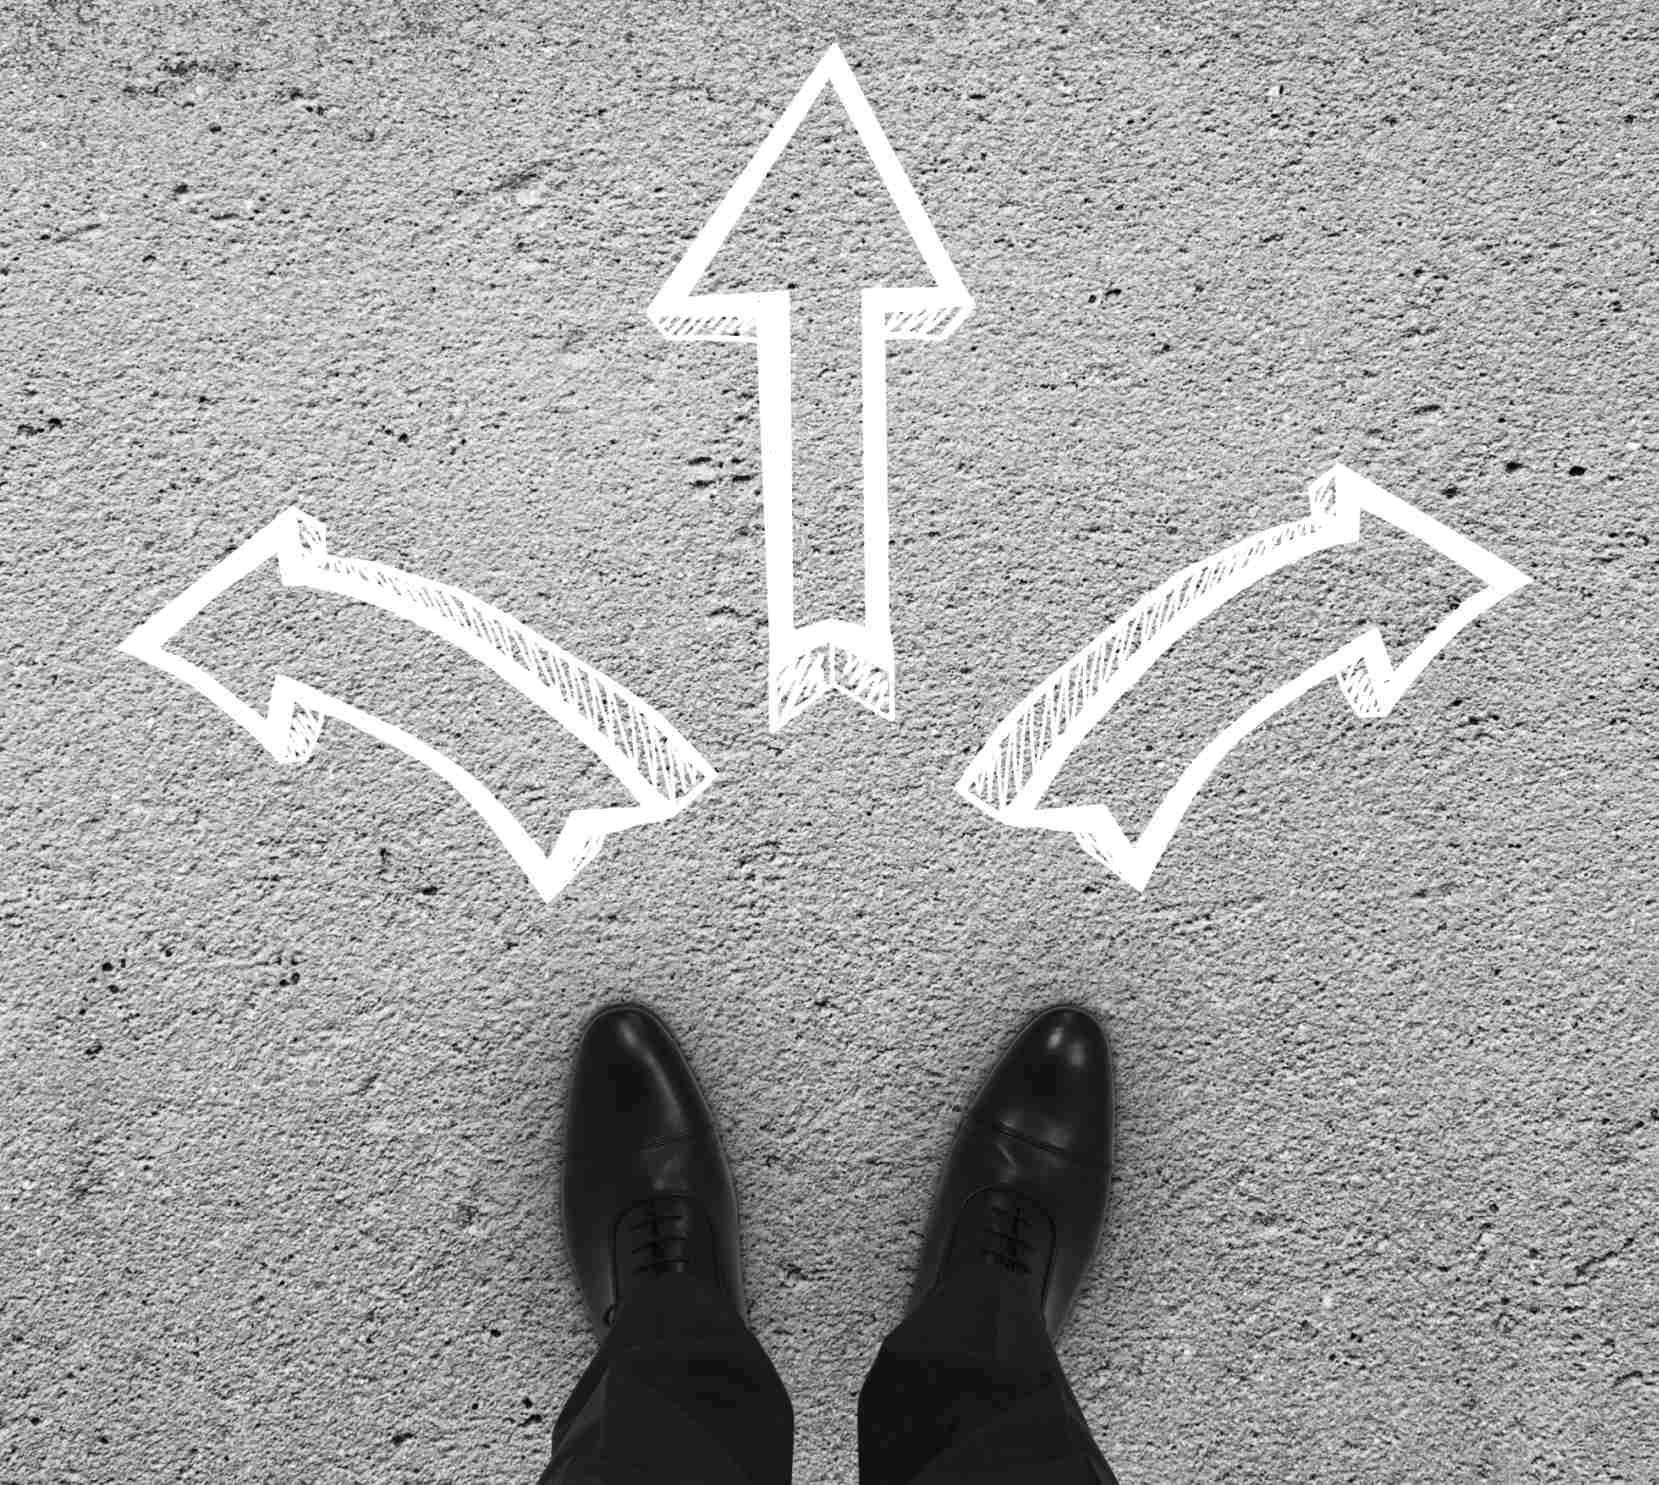 Decision path